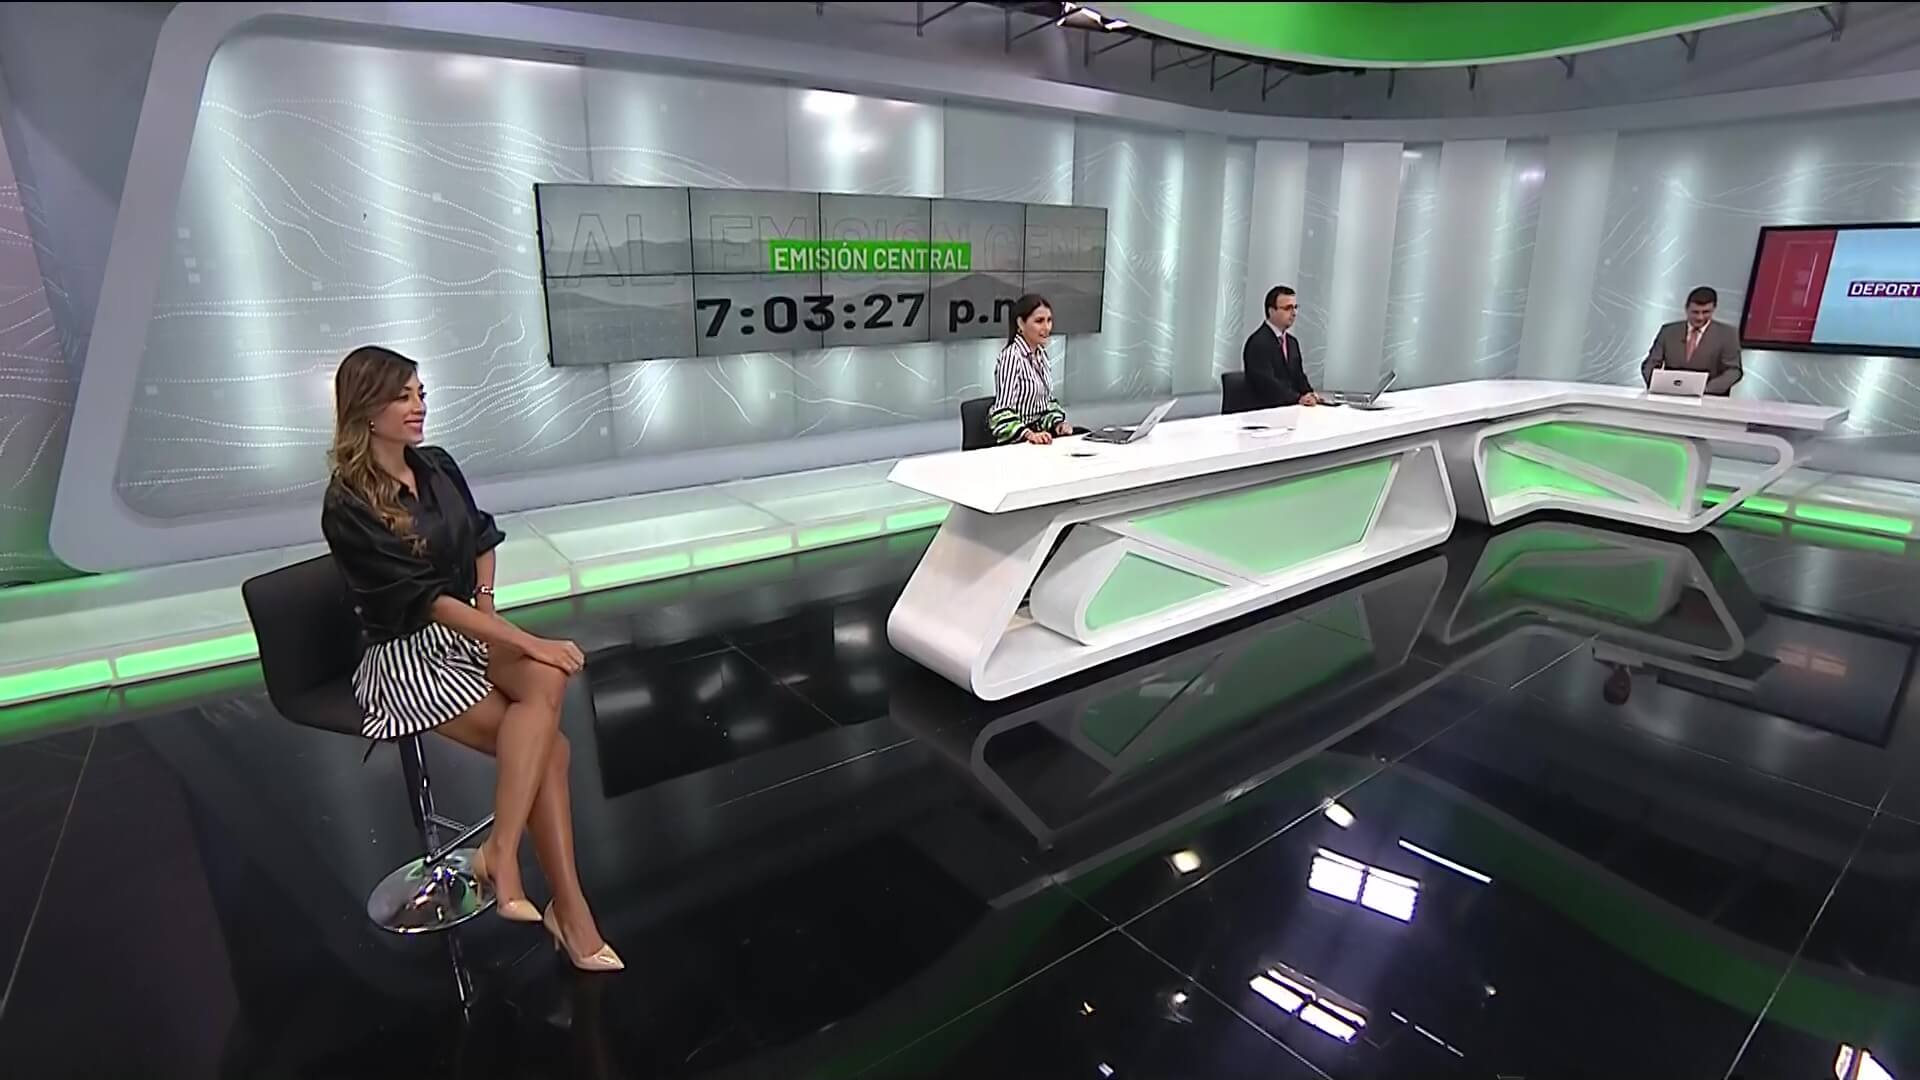 Teleantioquia Noticias - miércoles 16 de junio de 2021